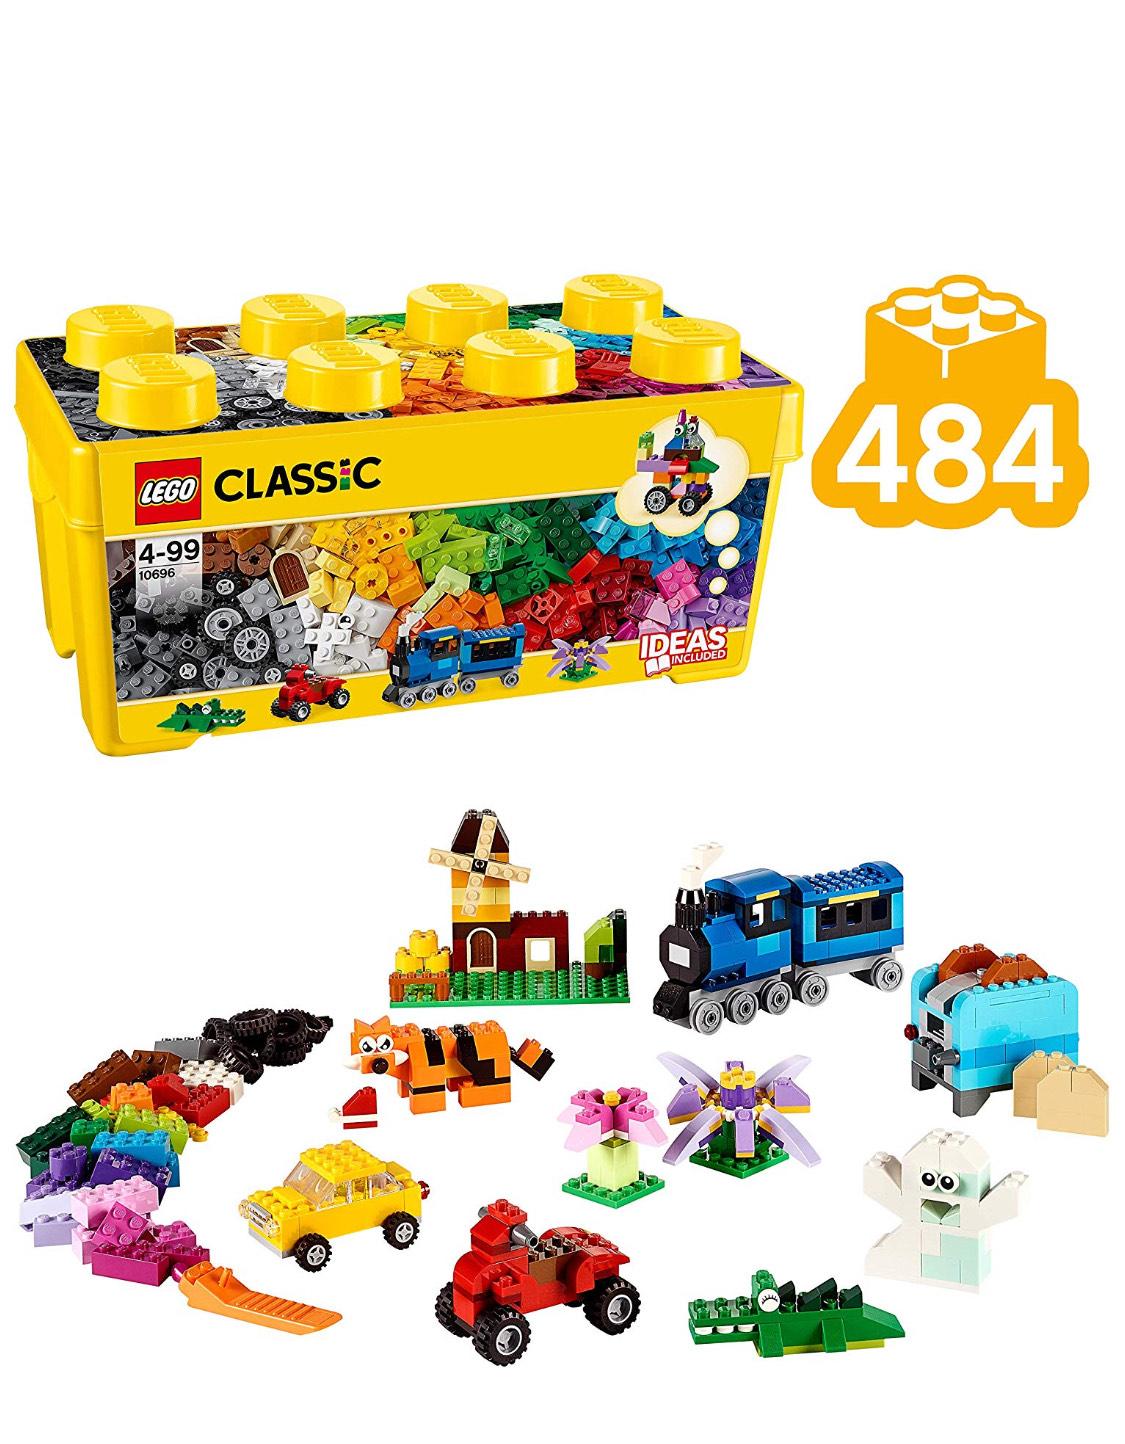 LEGO Classic - 484 Bloques. Caja de Ladrillos Creativa Mediana